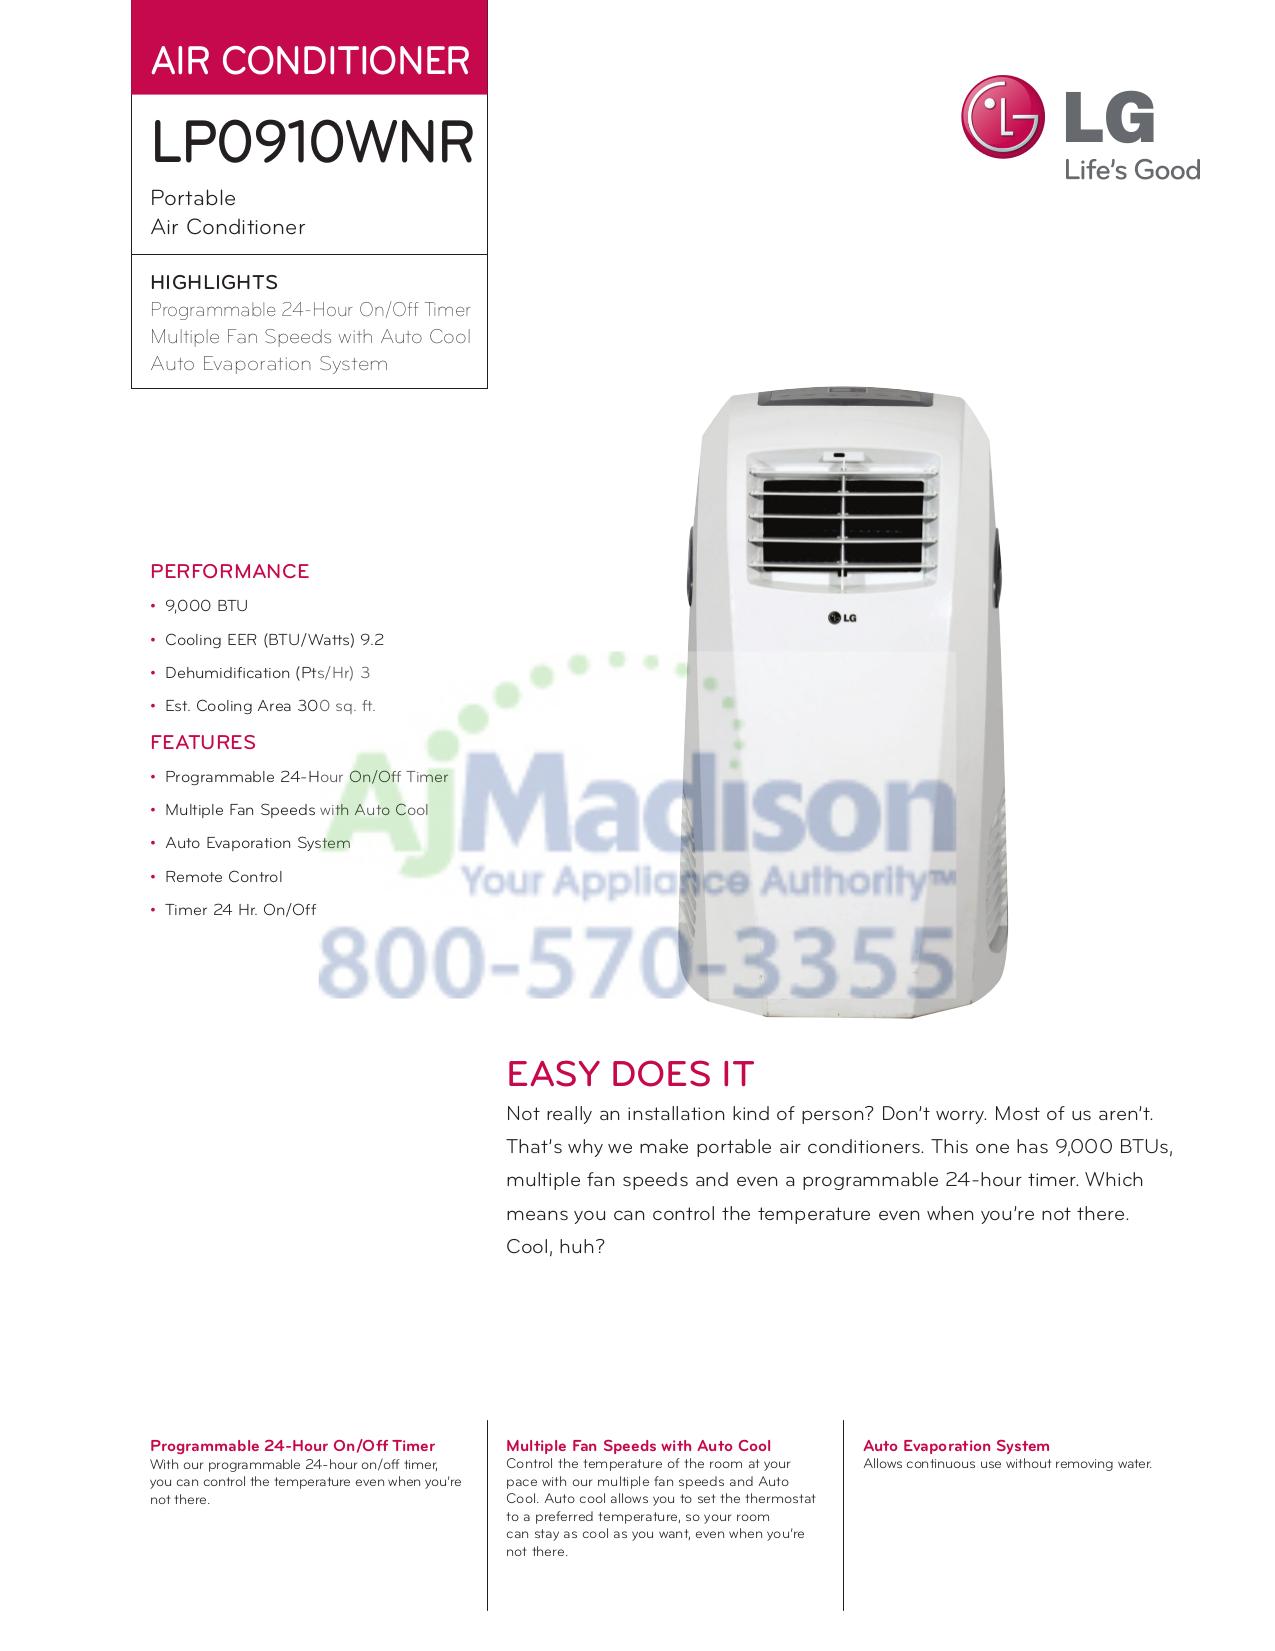 lg model lp0910wnr manual daily instruction manual guides u2022 rh testingwordpress co LG Air Conditioner Model S12coc lg lp0910wnr 9000 btu portable air conditioner manual